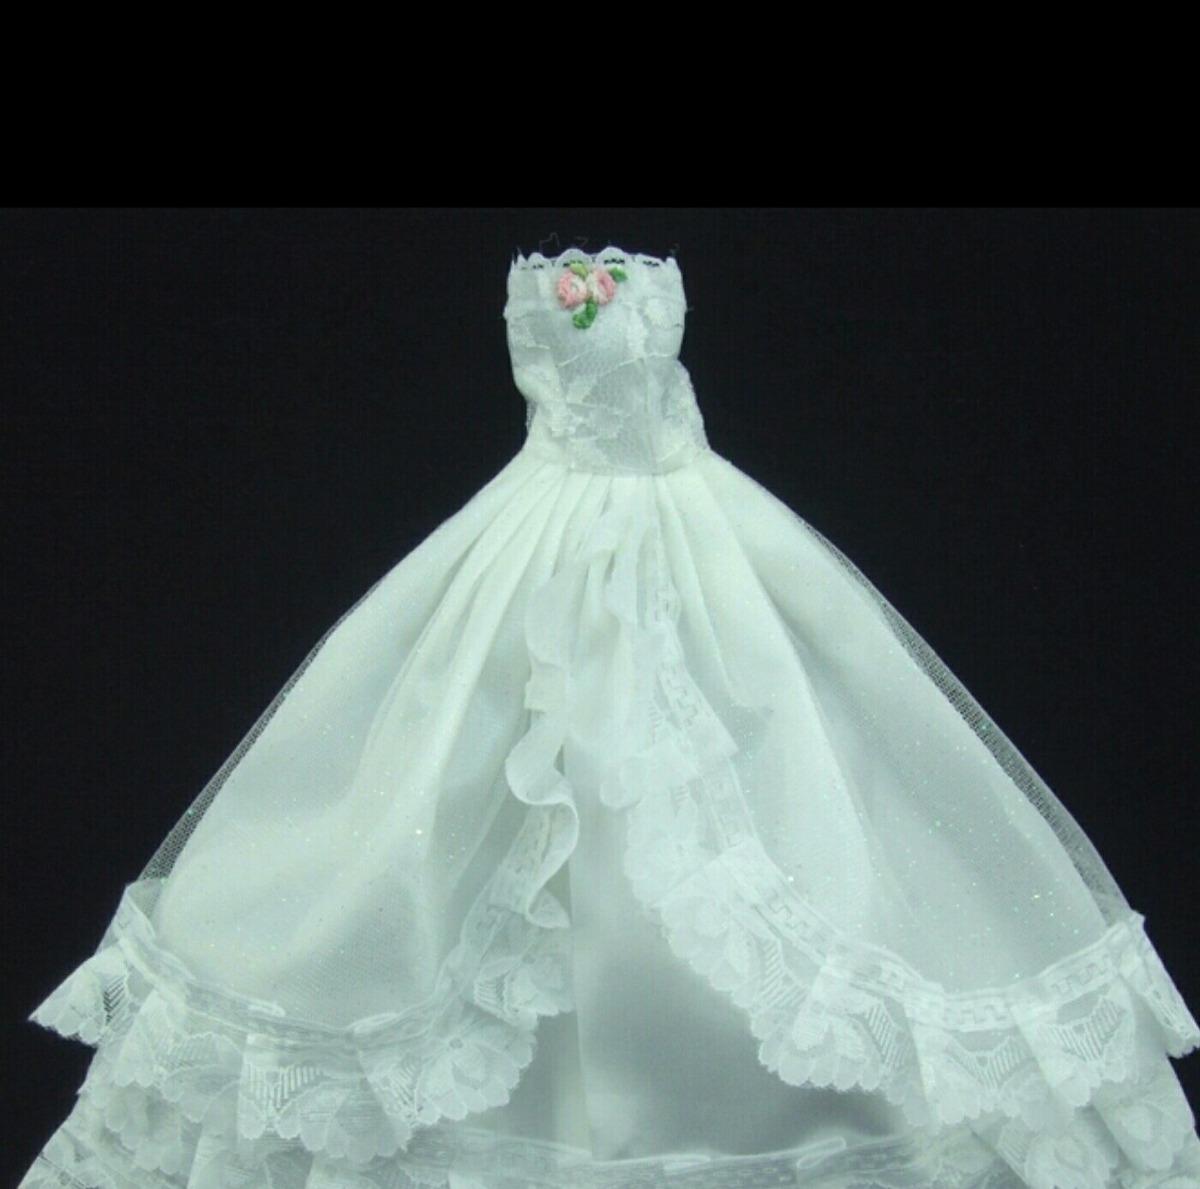 Barbie Vestido De Novia Y Traje De Novio ( Tamaño Barbie) - $ 45.000 ...